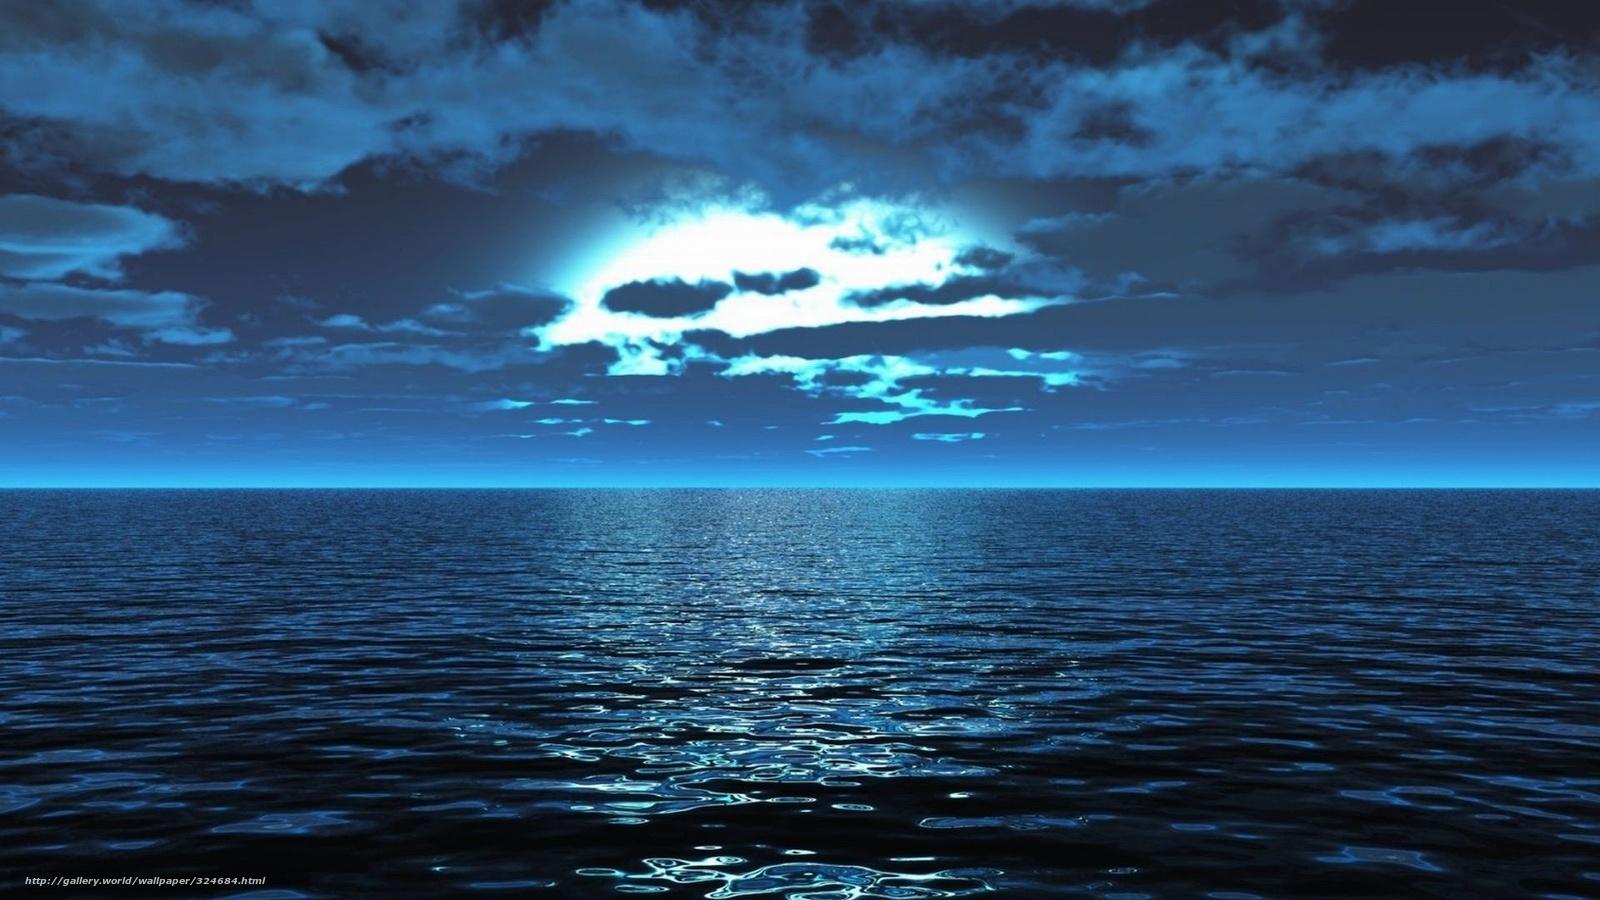 Download wallpaper Smooth surface, blue, Sea free desktop wallpaper in ...